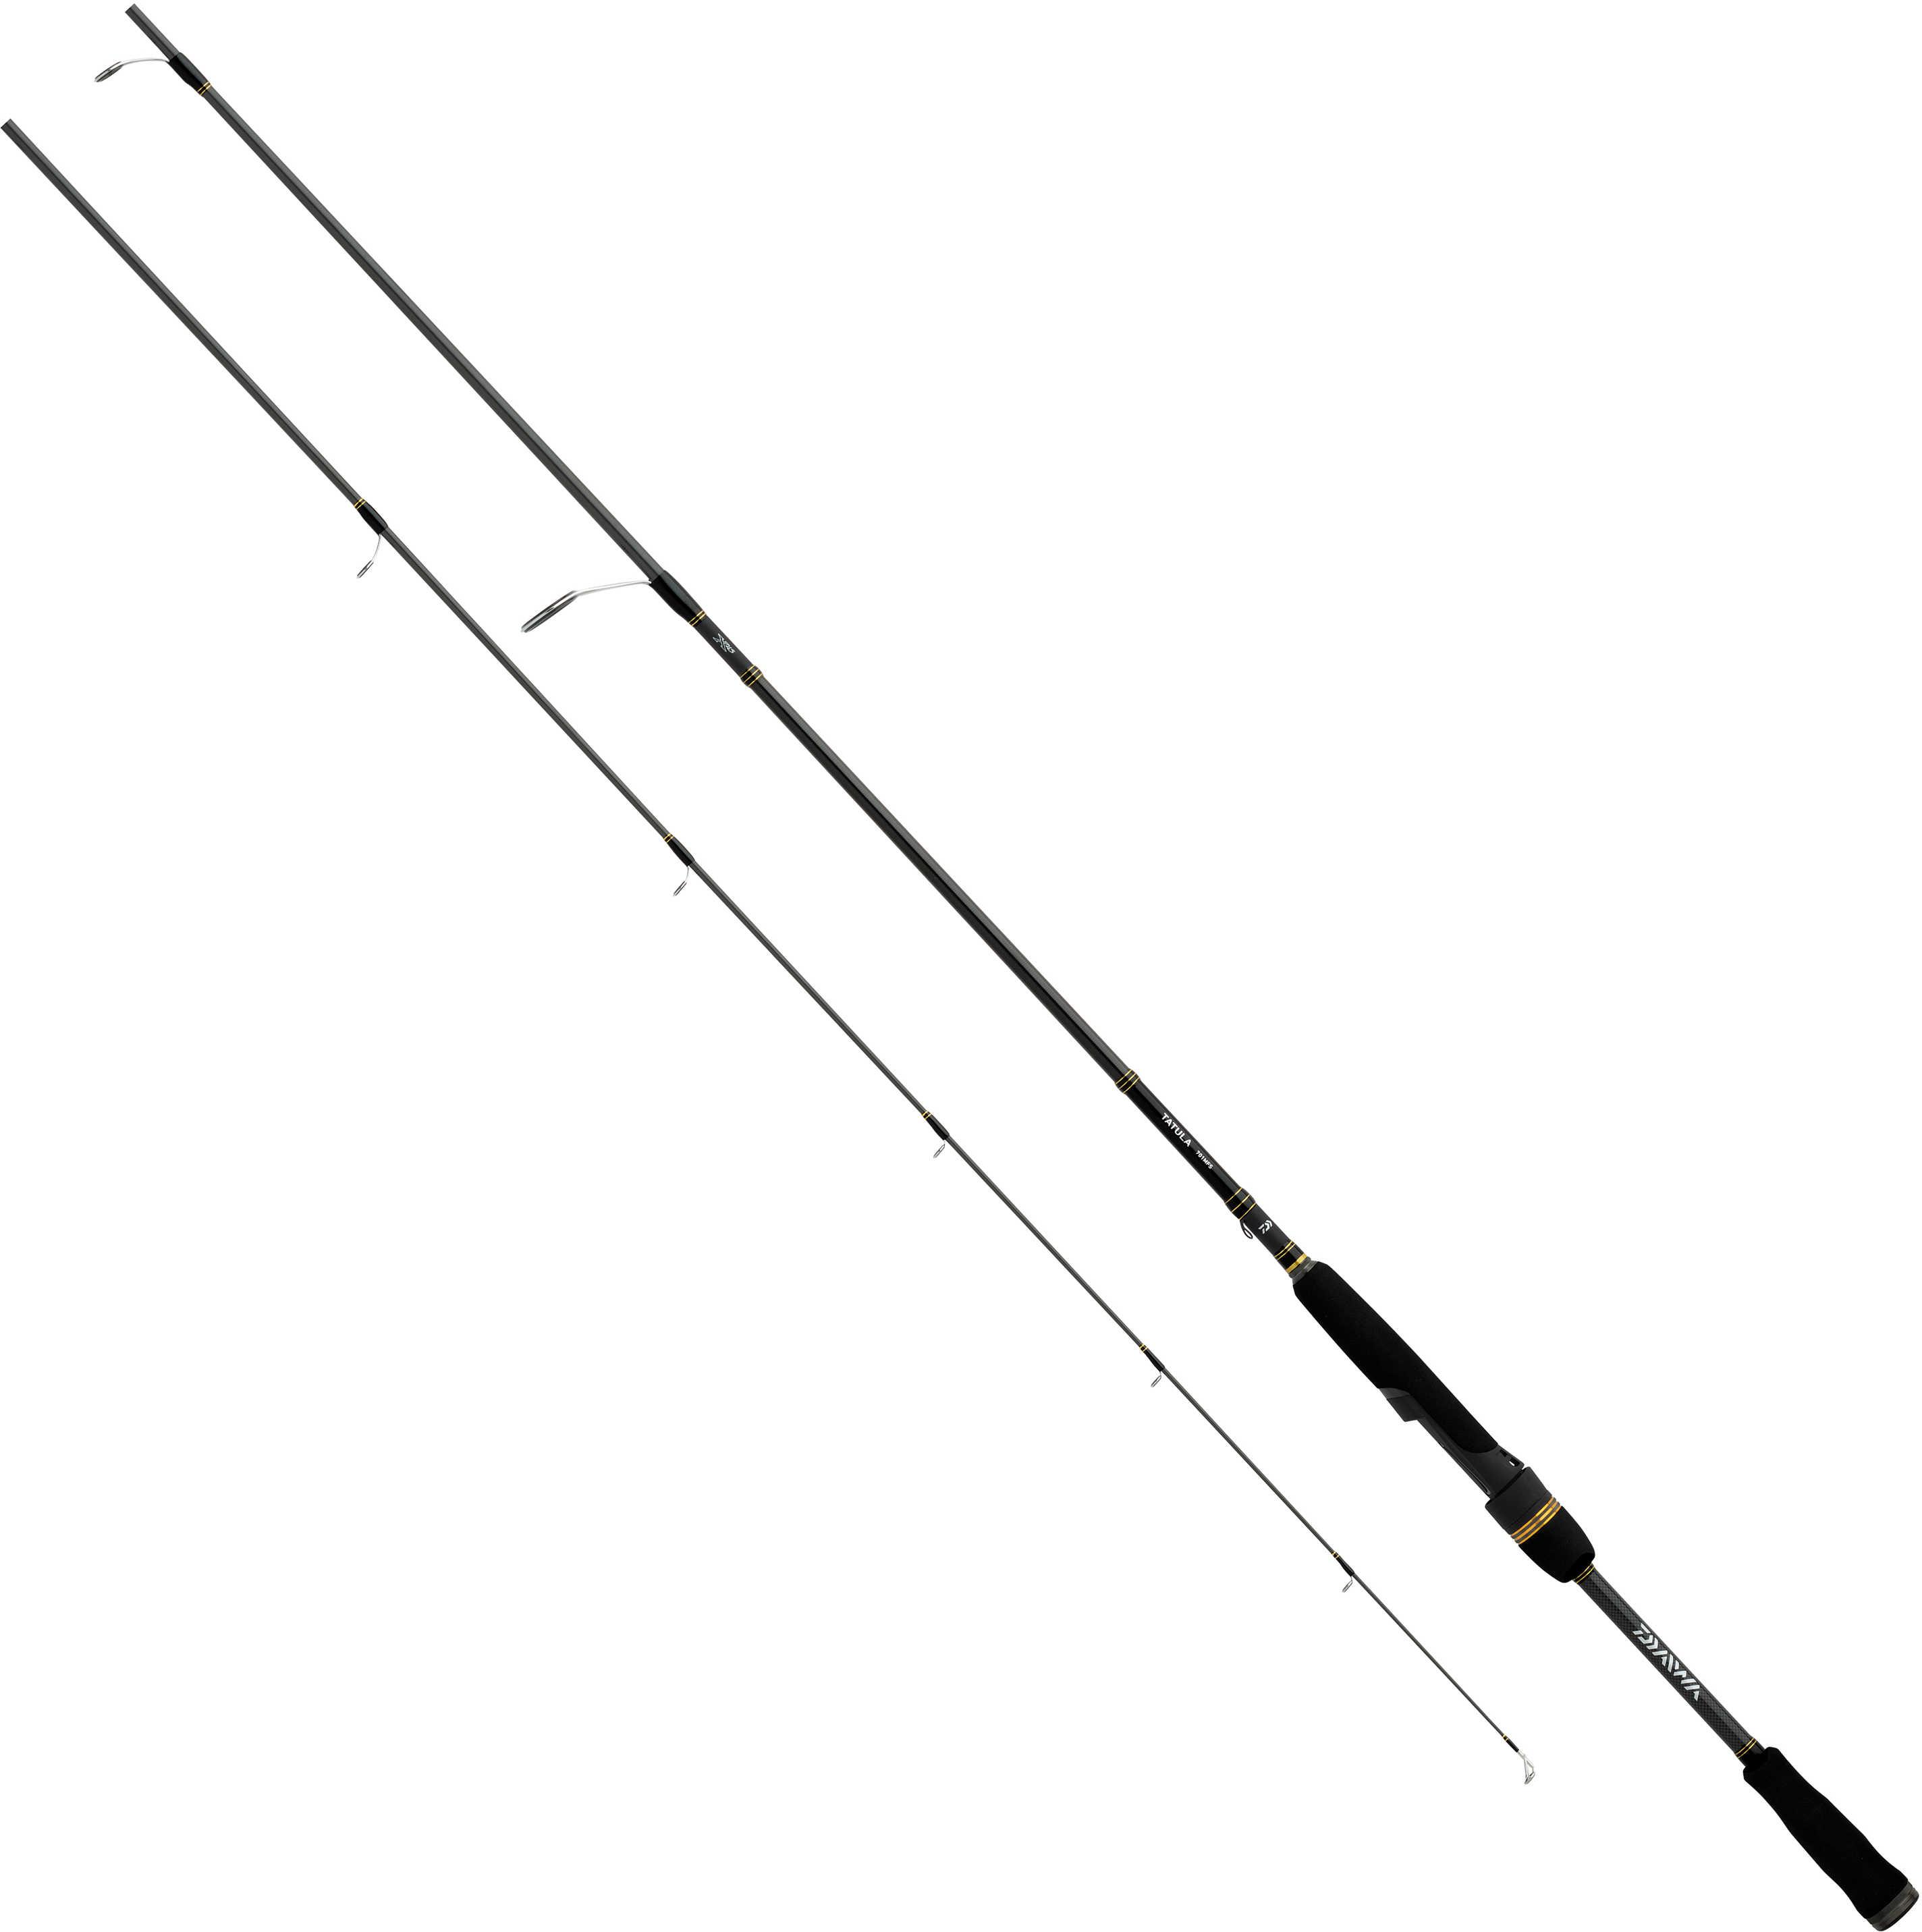 Daiwa Tatula Rod Spinning, 7', Medium, Fast Md: Spinning Rod TAT701MFS